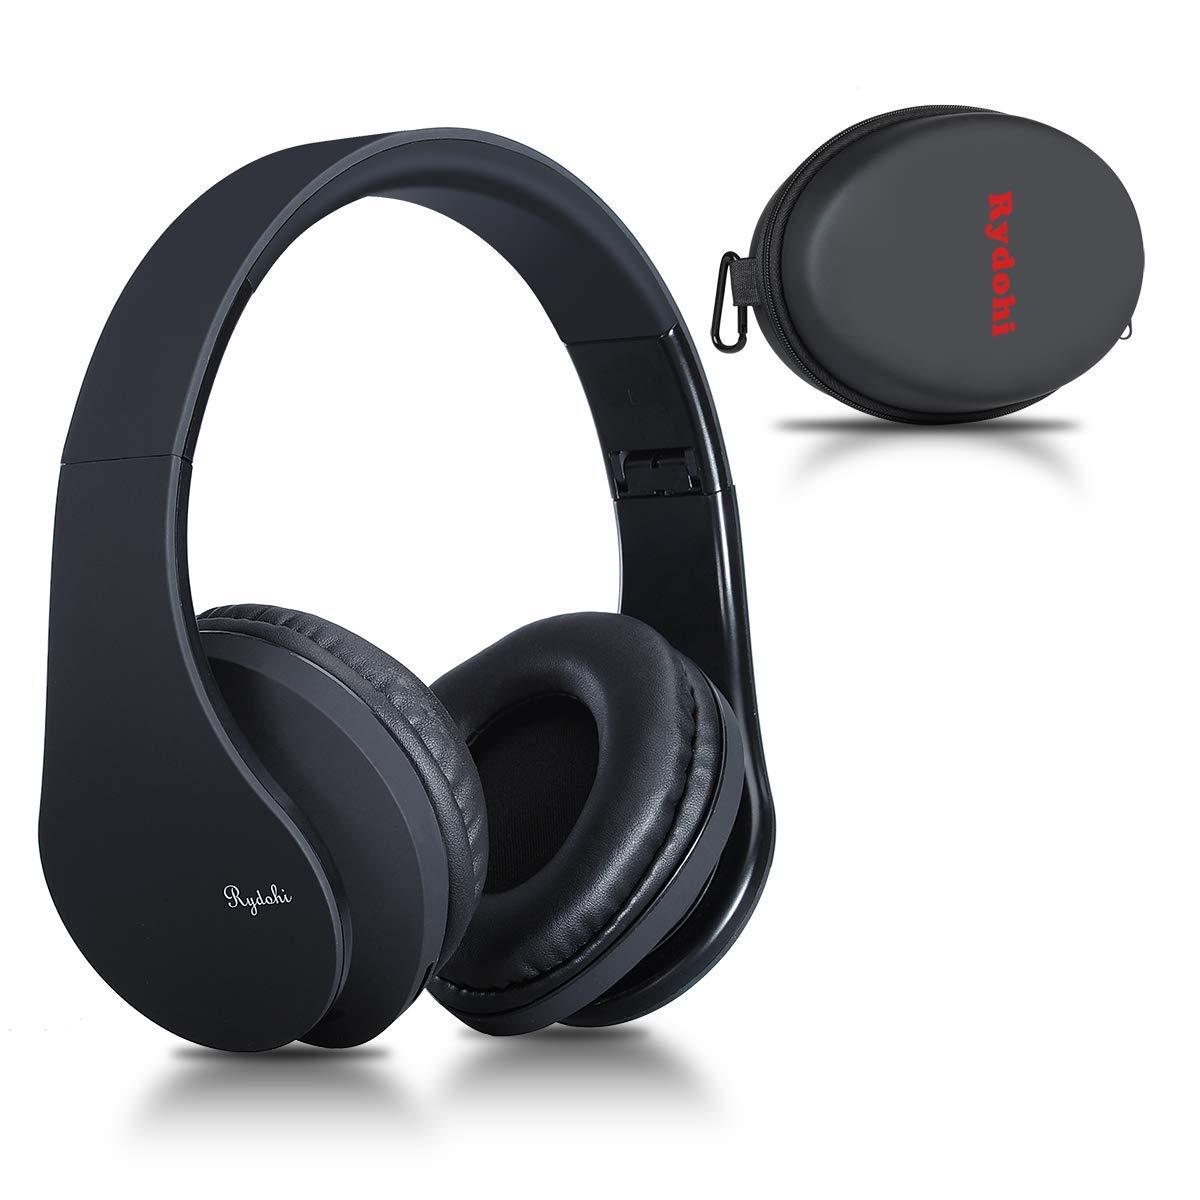 Rydohi Wireless Bluetooth Headphones Over Ear, Hi-Fi Stereo Headset with Deep Bass